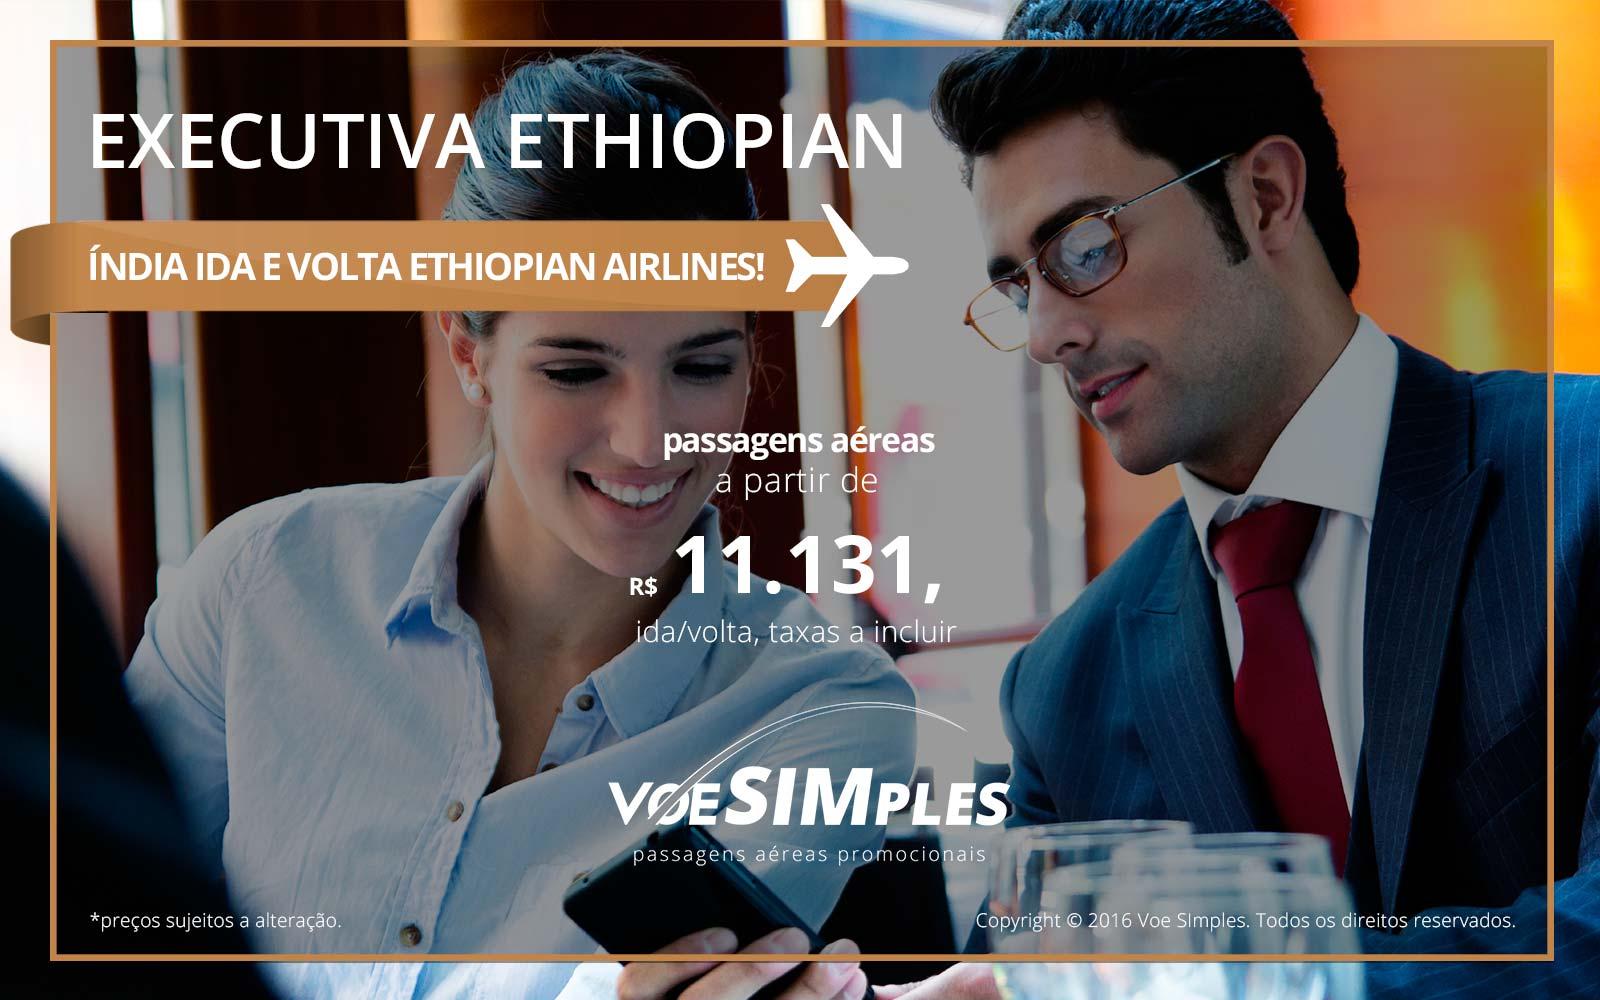 Passagem aérea Classe Executiva Ethiopian Airlines para Índia